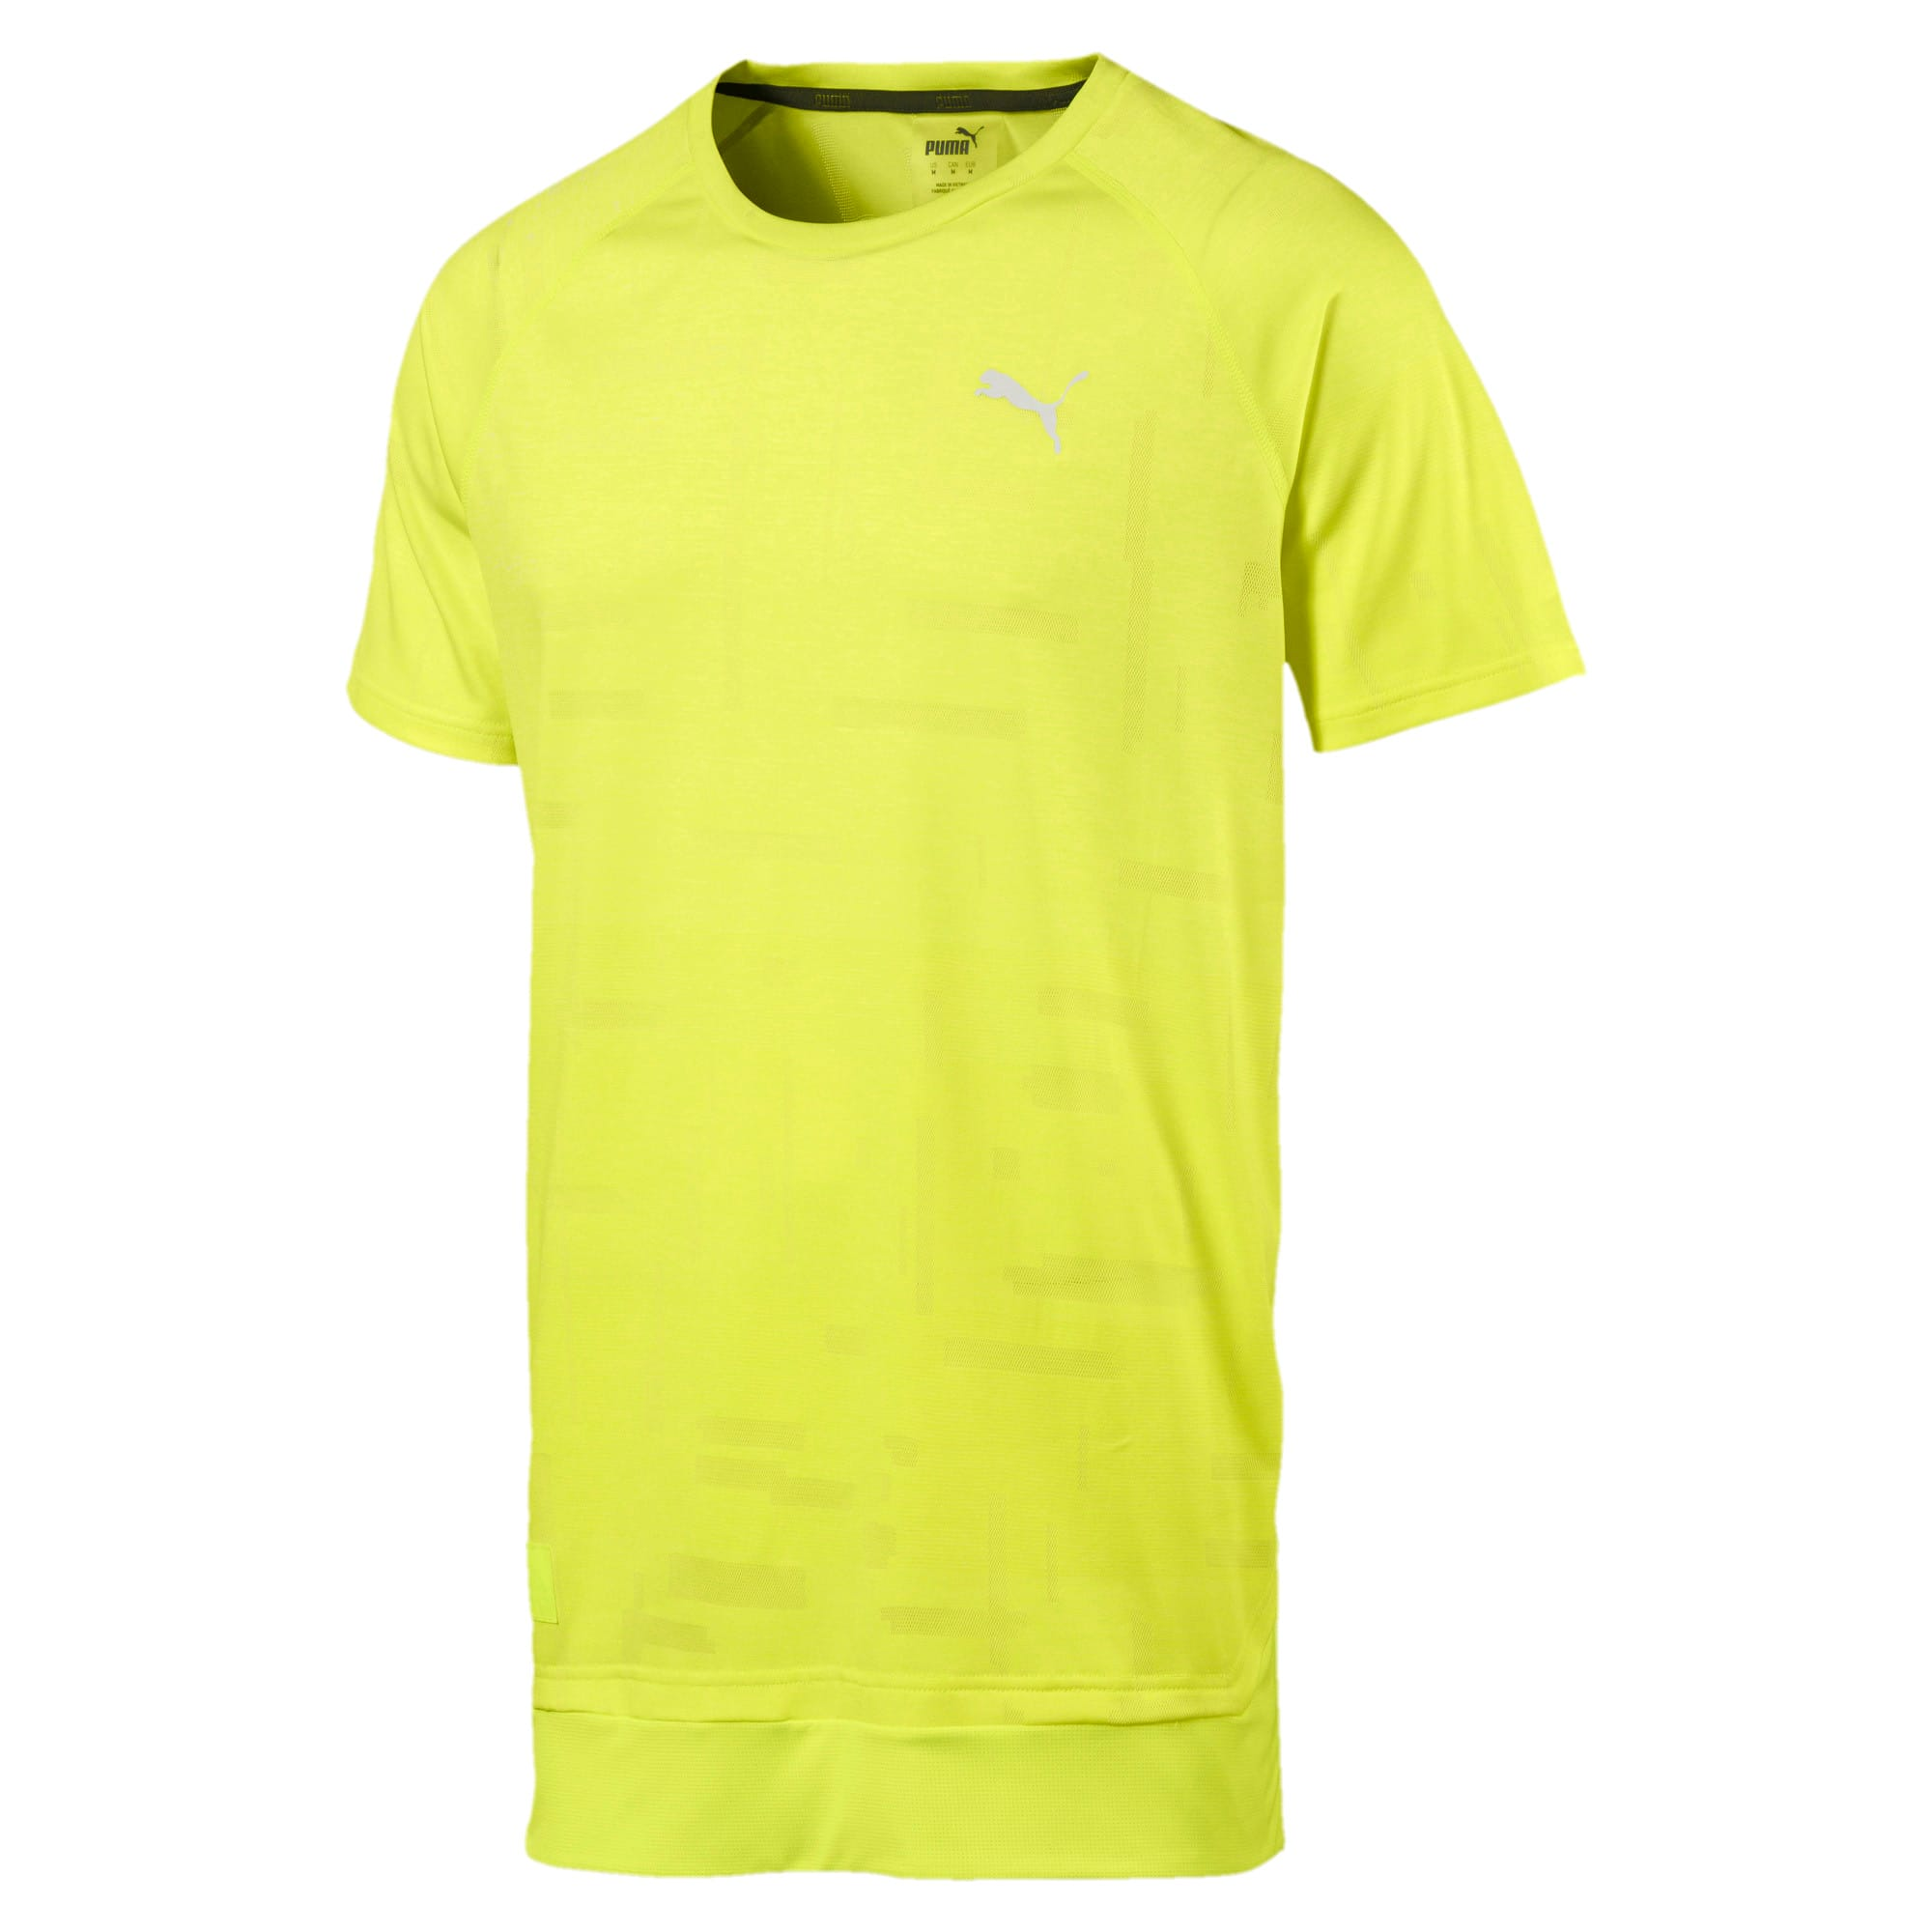 Thumbnail 4 of Energy Tech Herren Training T-Shirt, Fizzy Yellow, medium